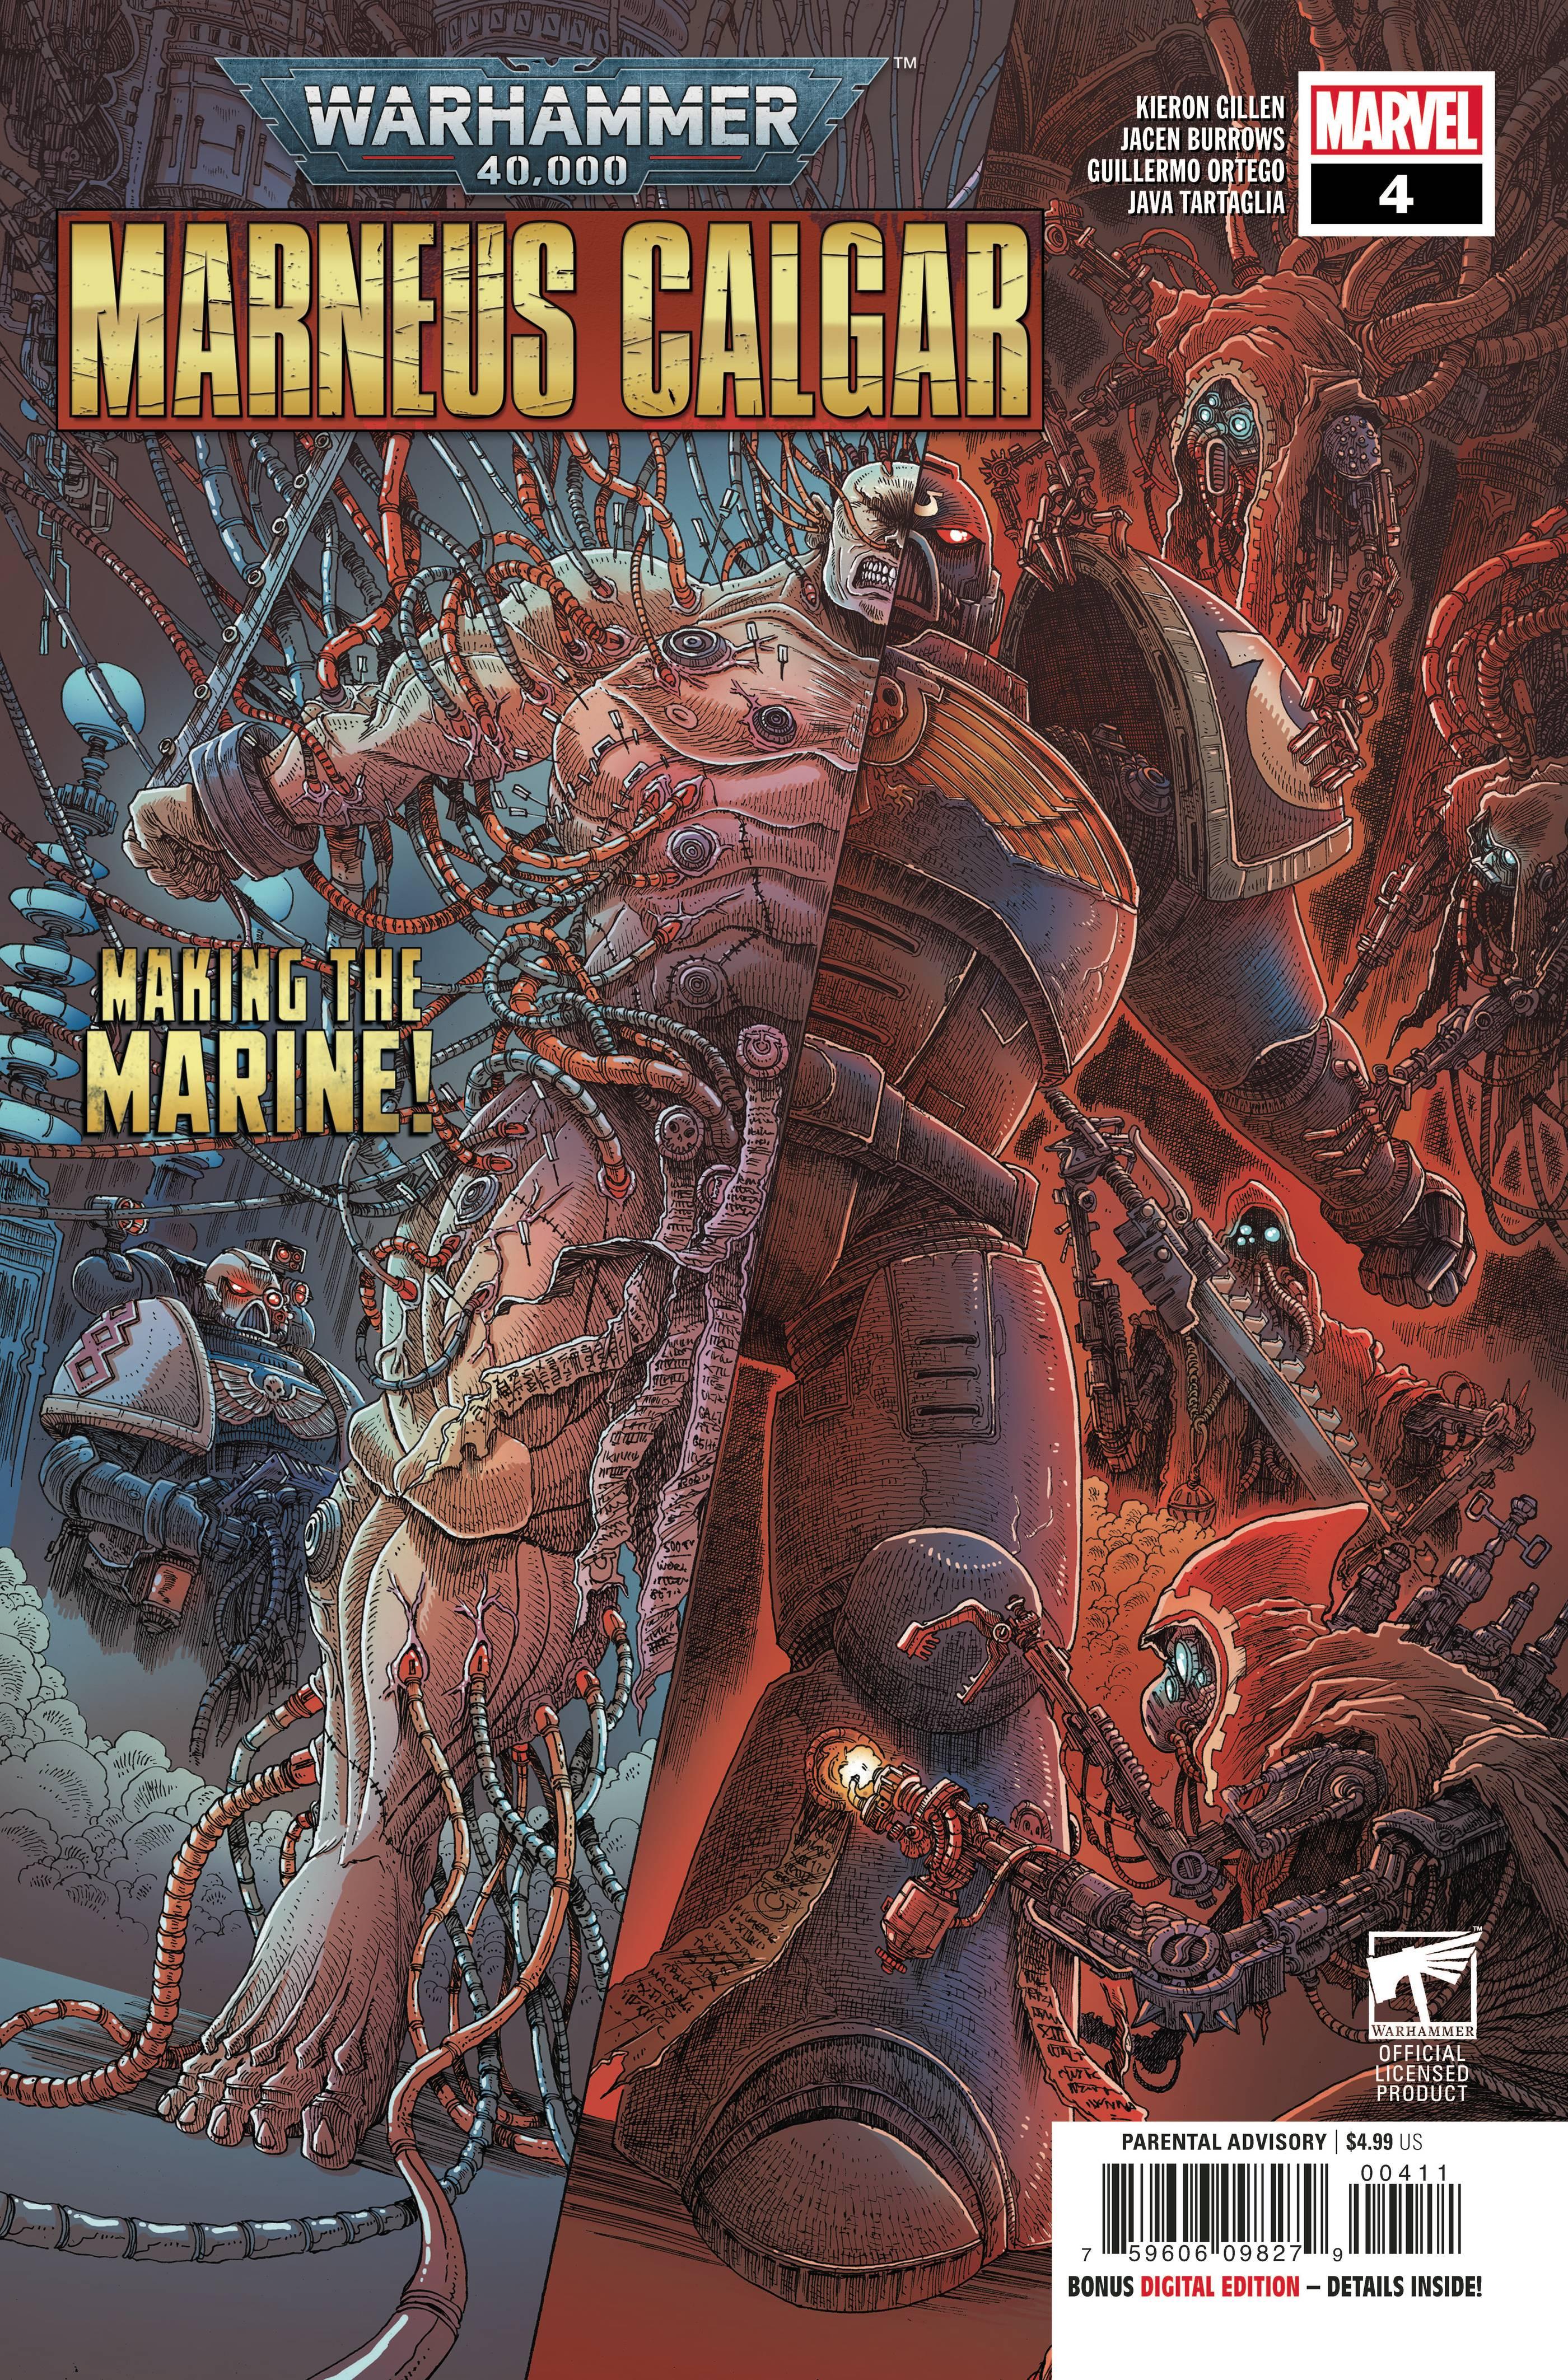 Warhammer 40,000: Marneus Calgar #4 (2021)